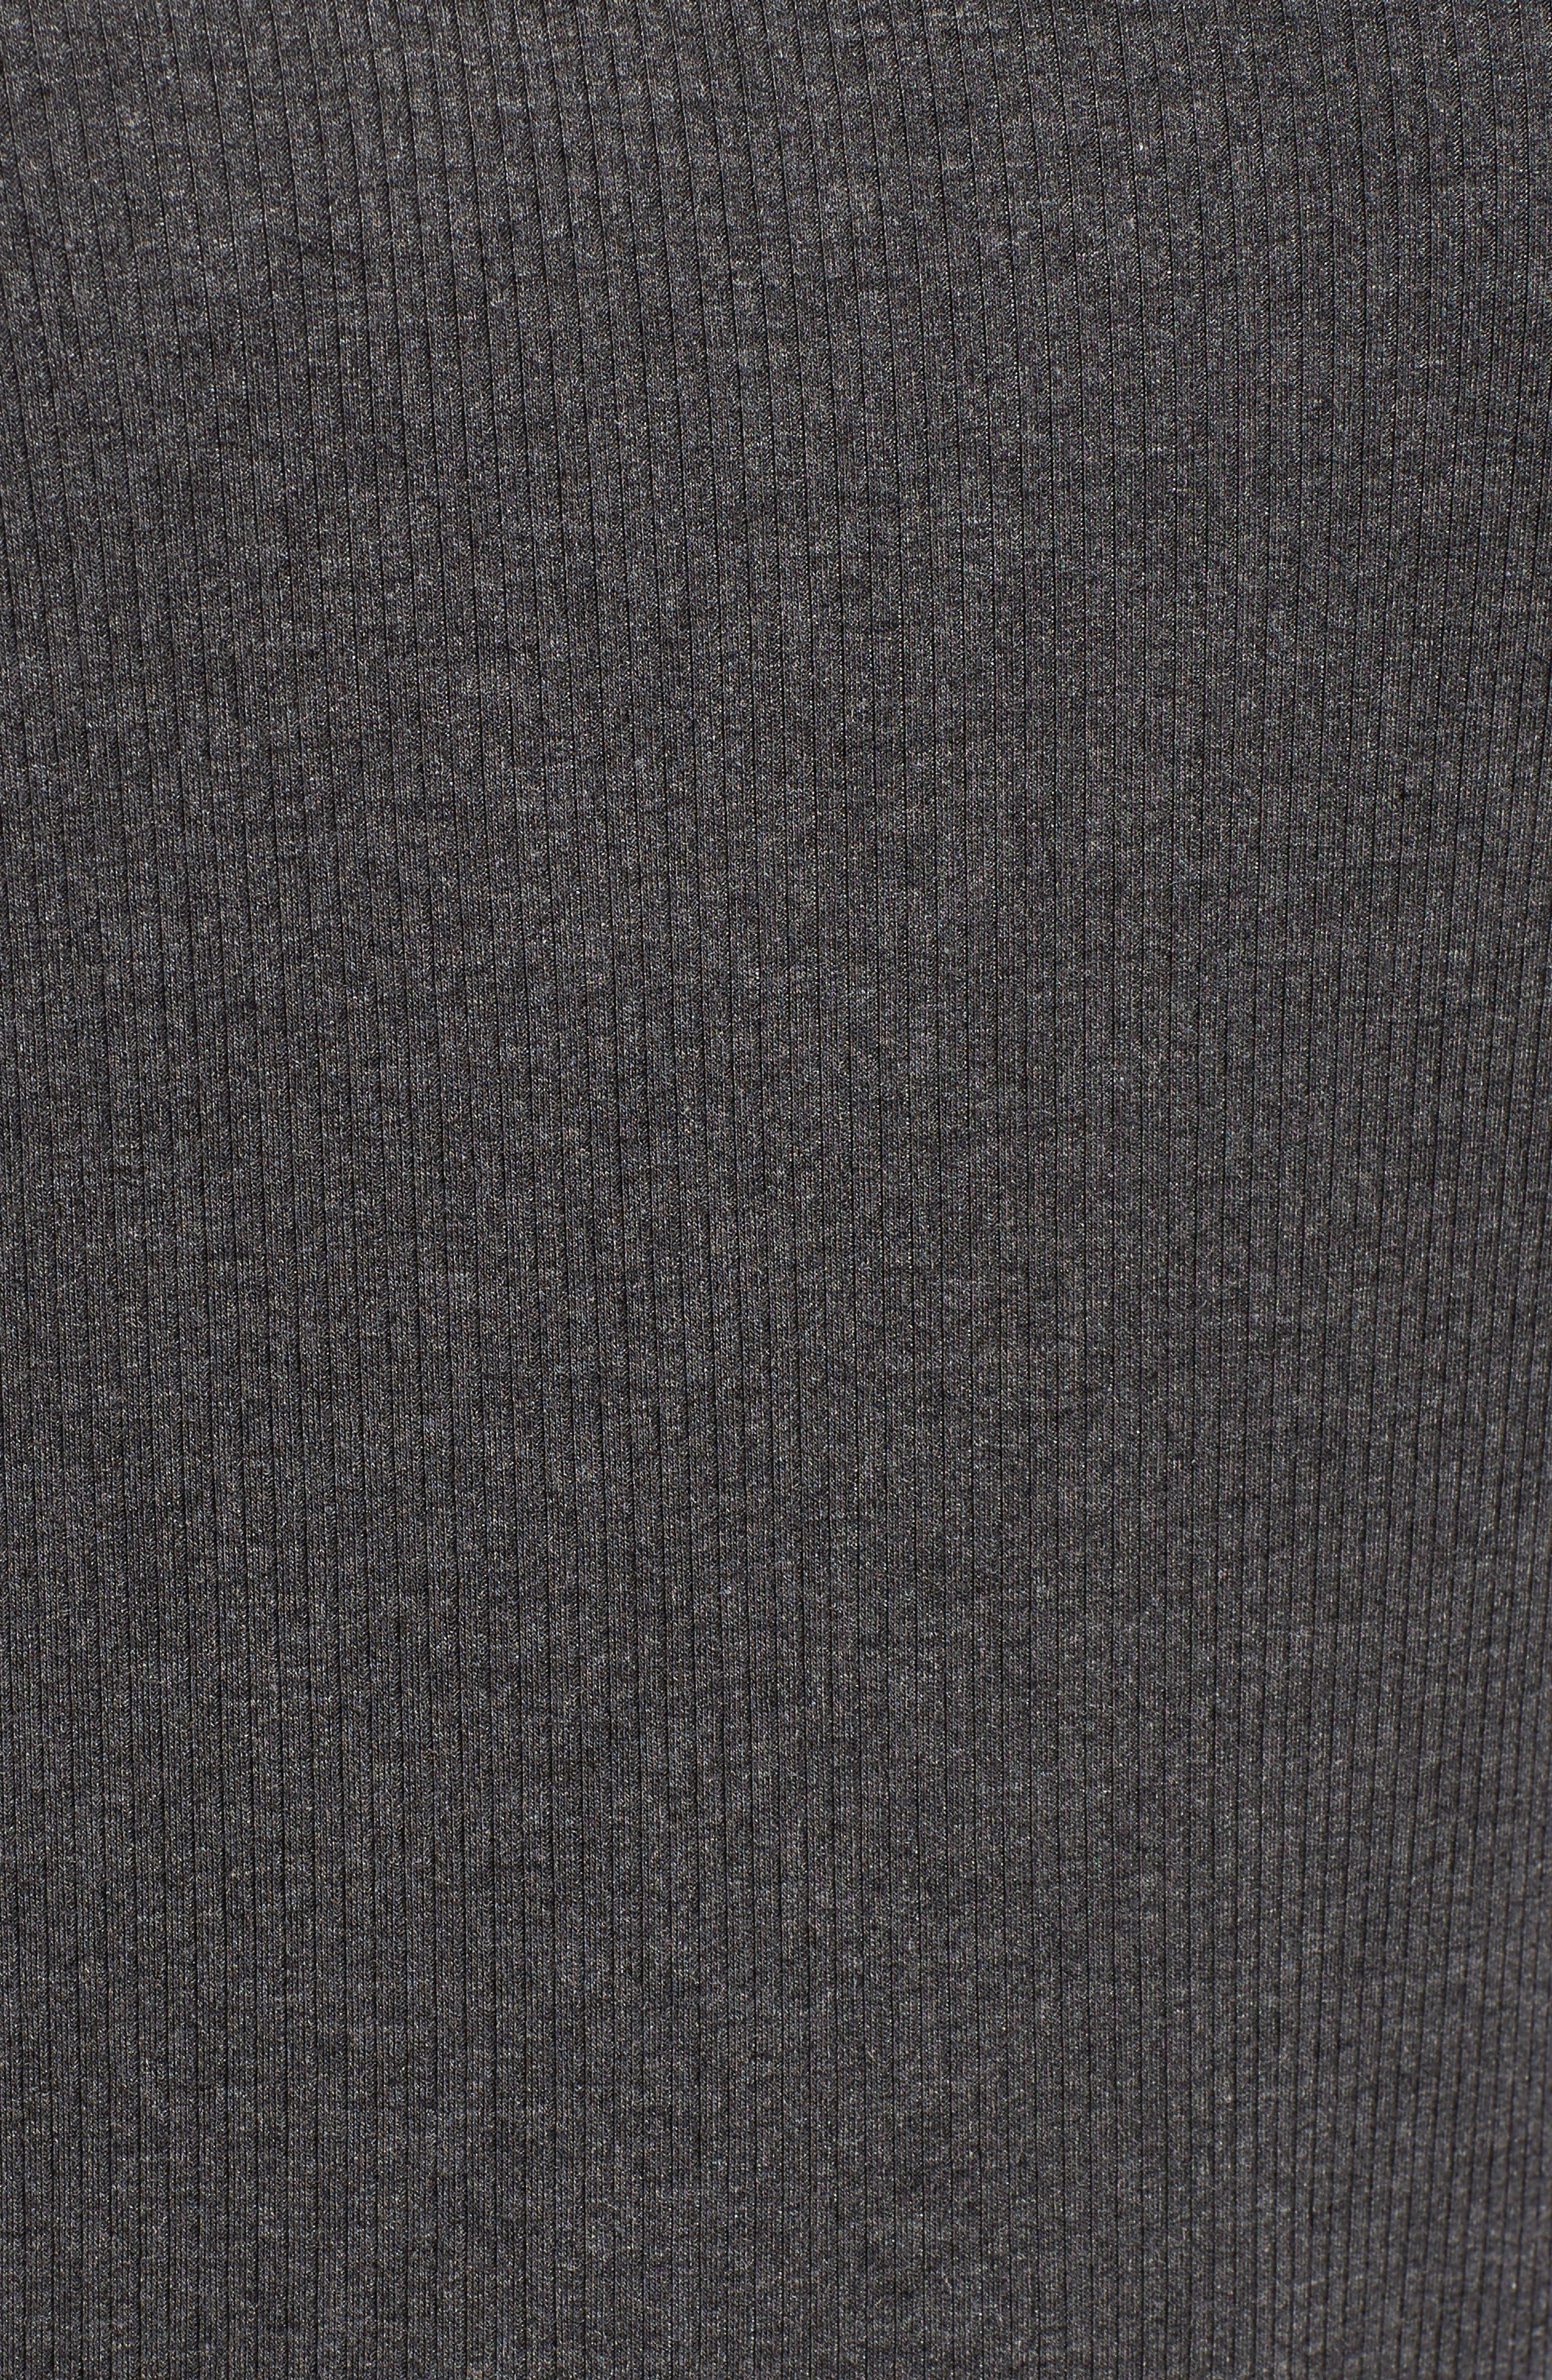 Tiered Ruffled Shoulder Ribbed Top,                             Alternate thumbnail 5, color,                             Medium Heather Grey